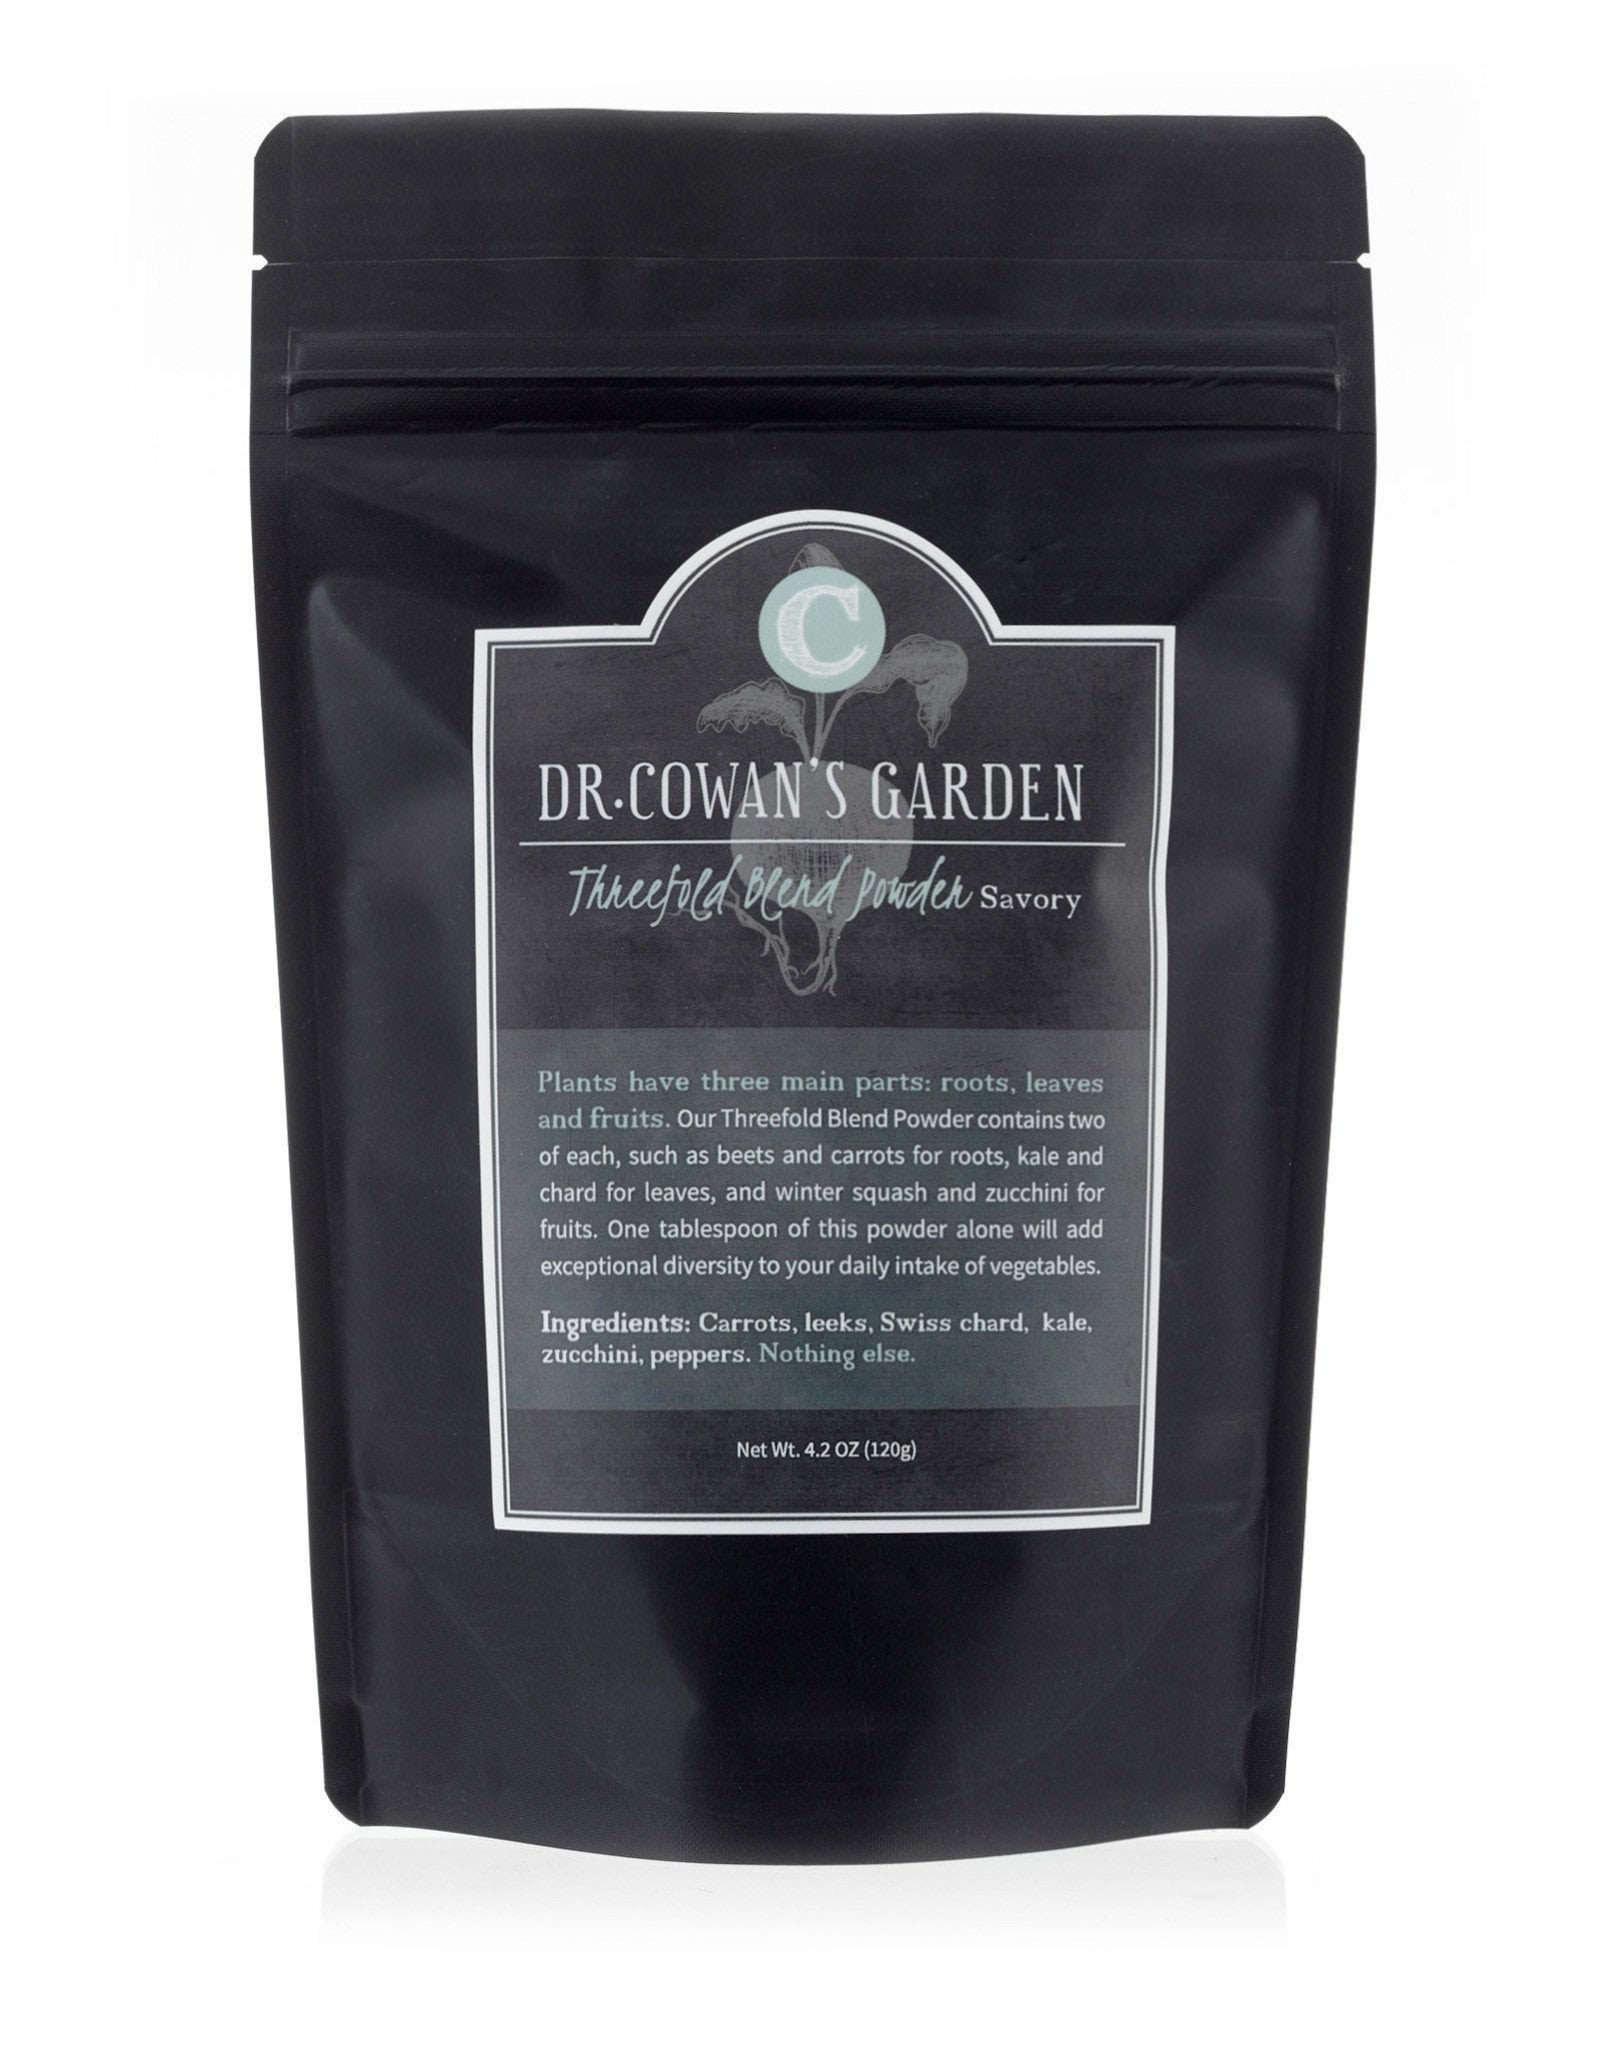 Image of Dr. Cowan's Garden Threefold Blend Powder (Savory) - Refill Pouch